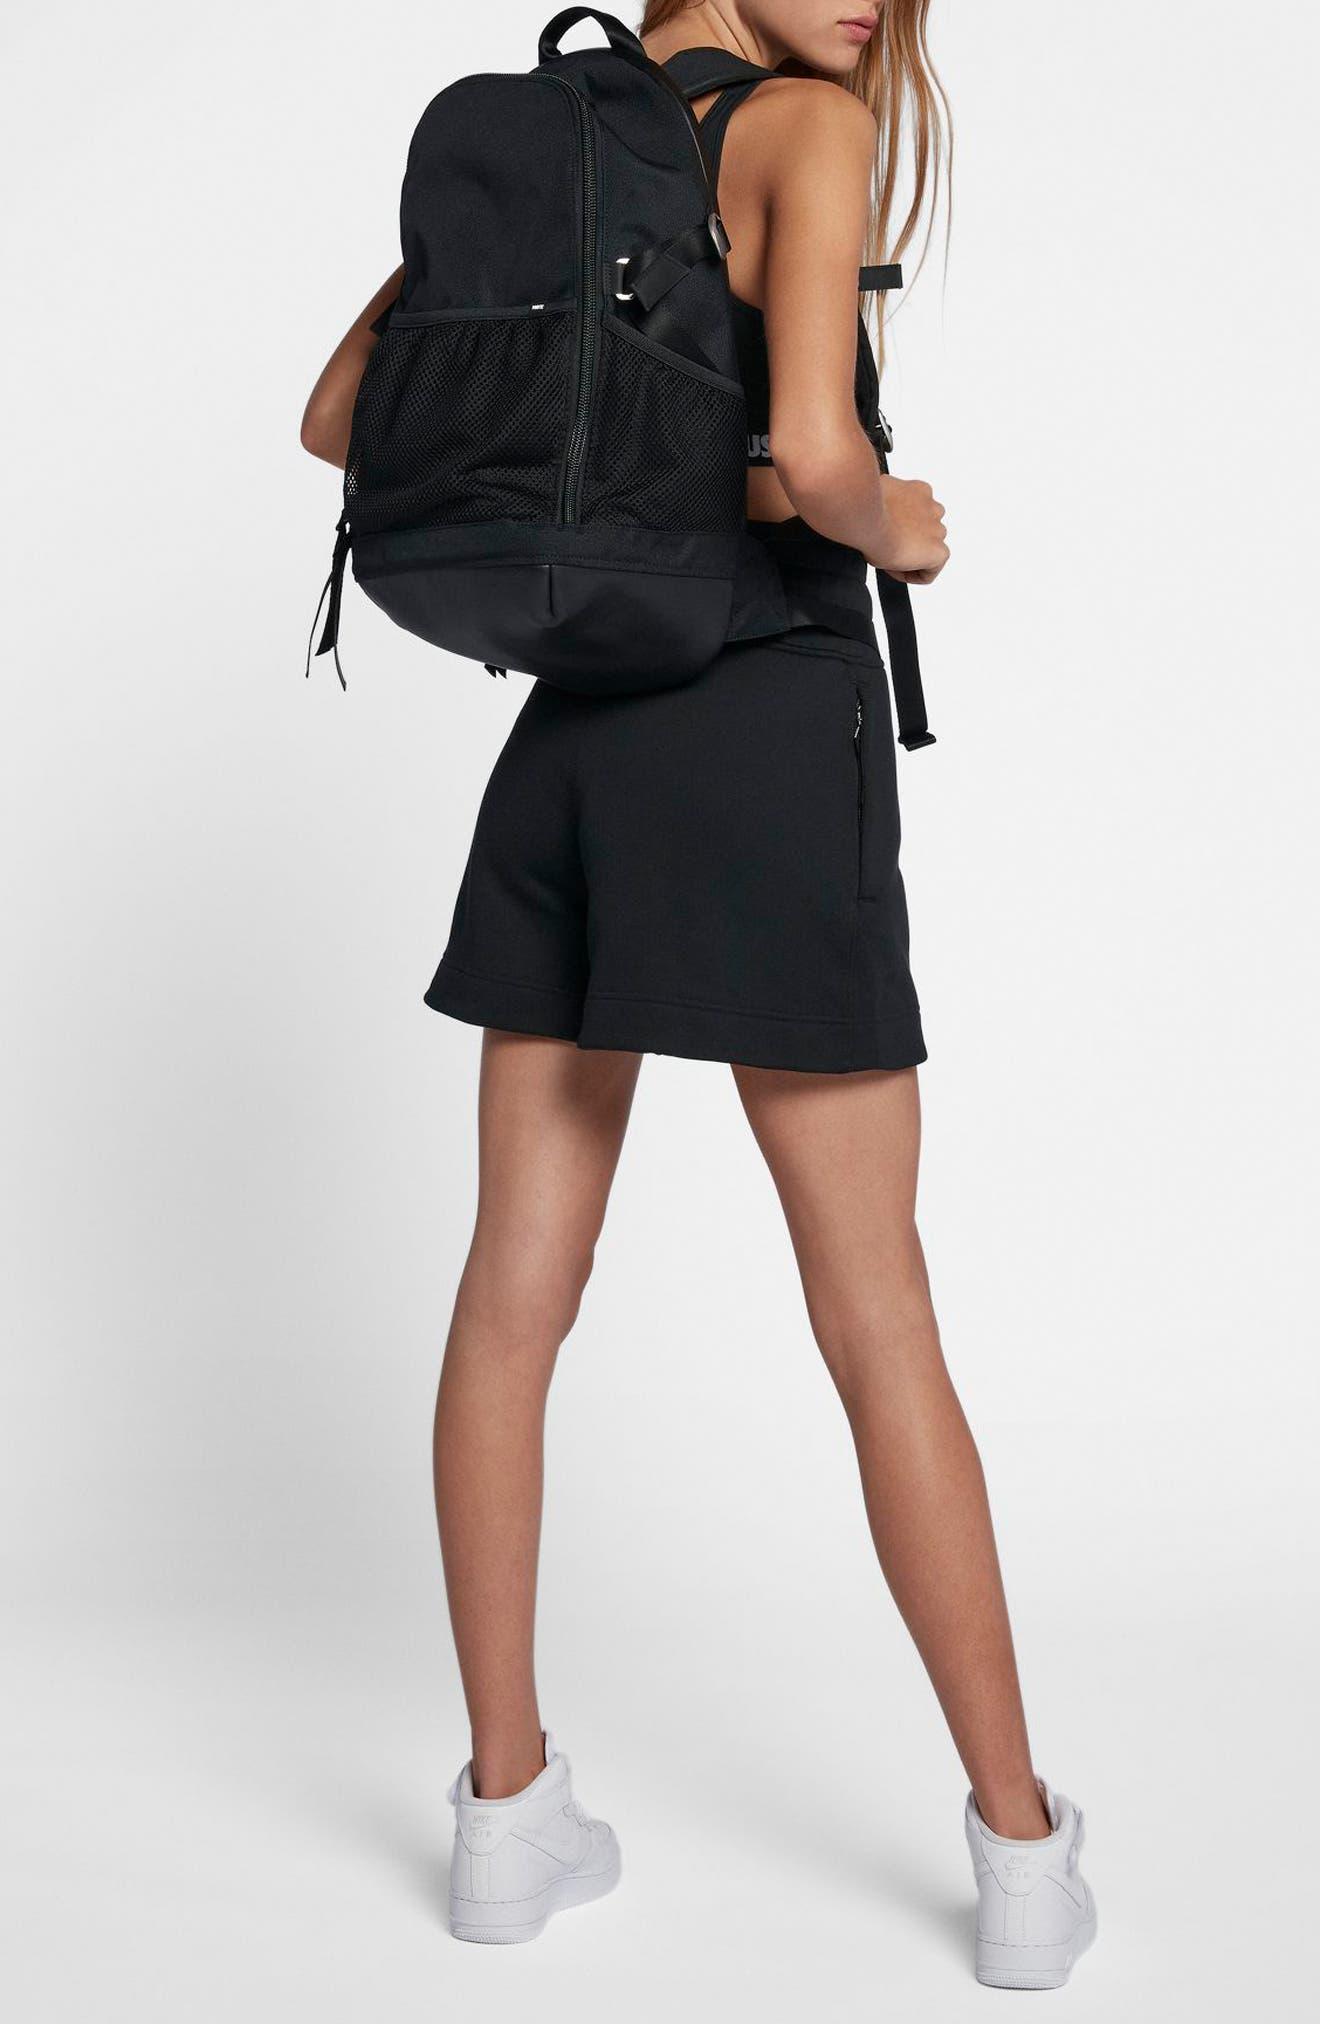 NikeLab Laptop Backpack,                             Alternate thumbnail 2, color,                             010